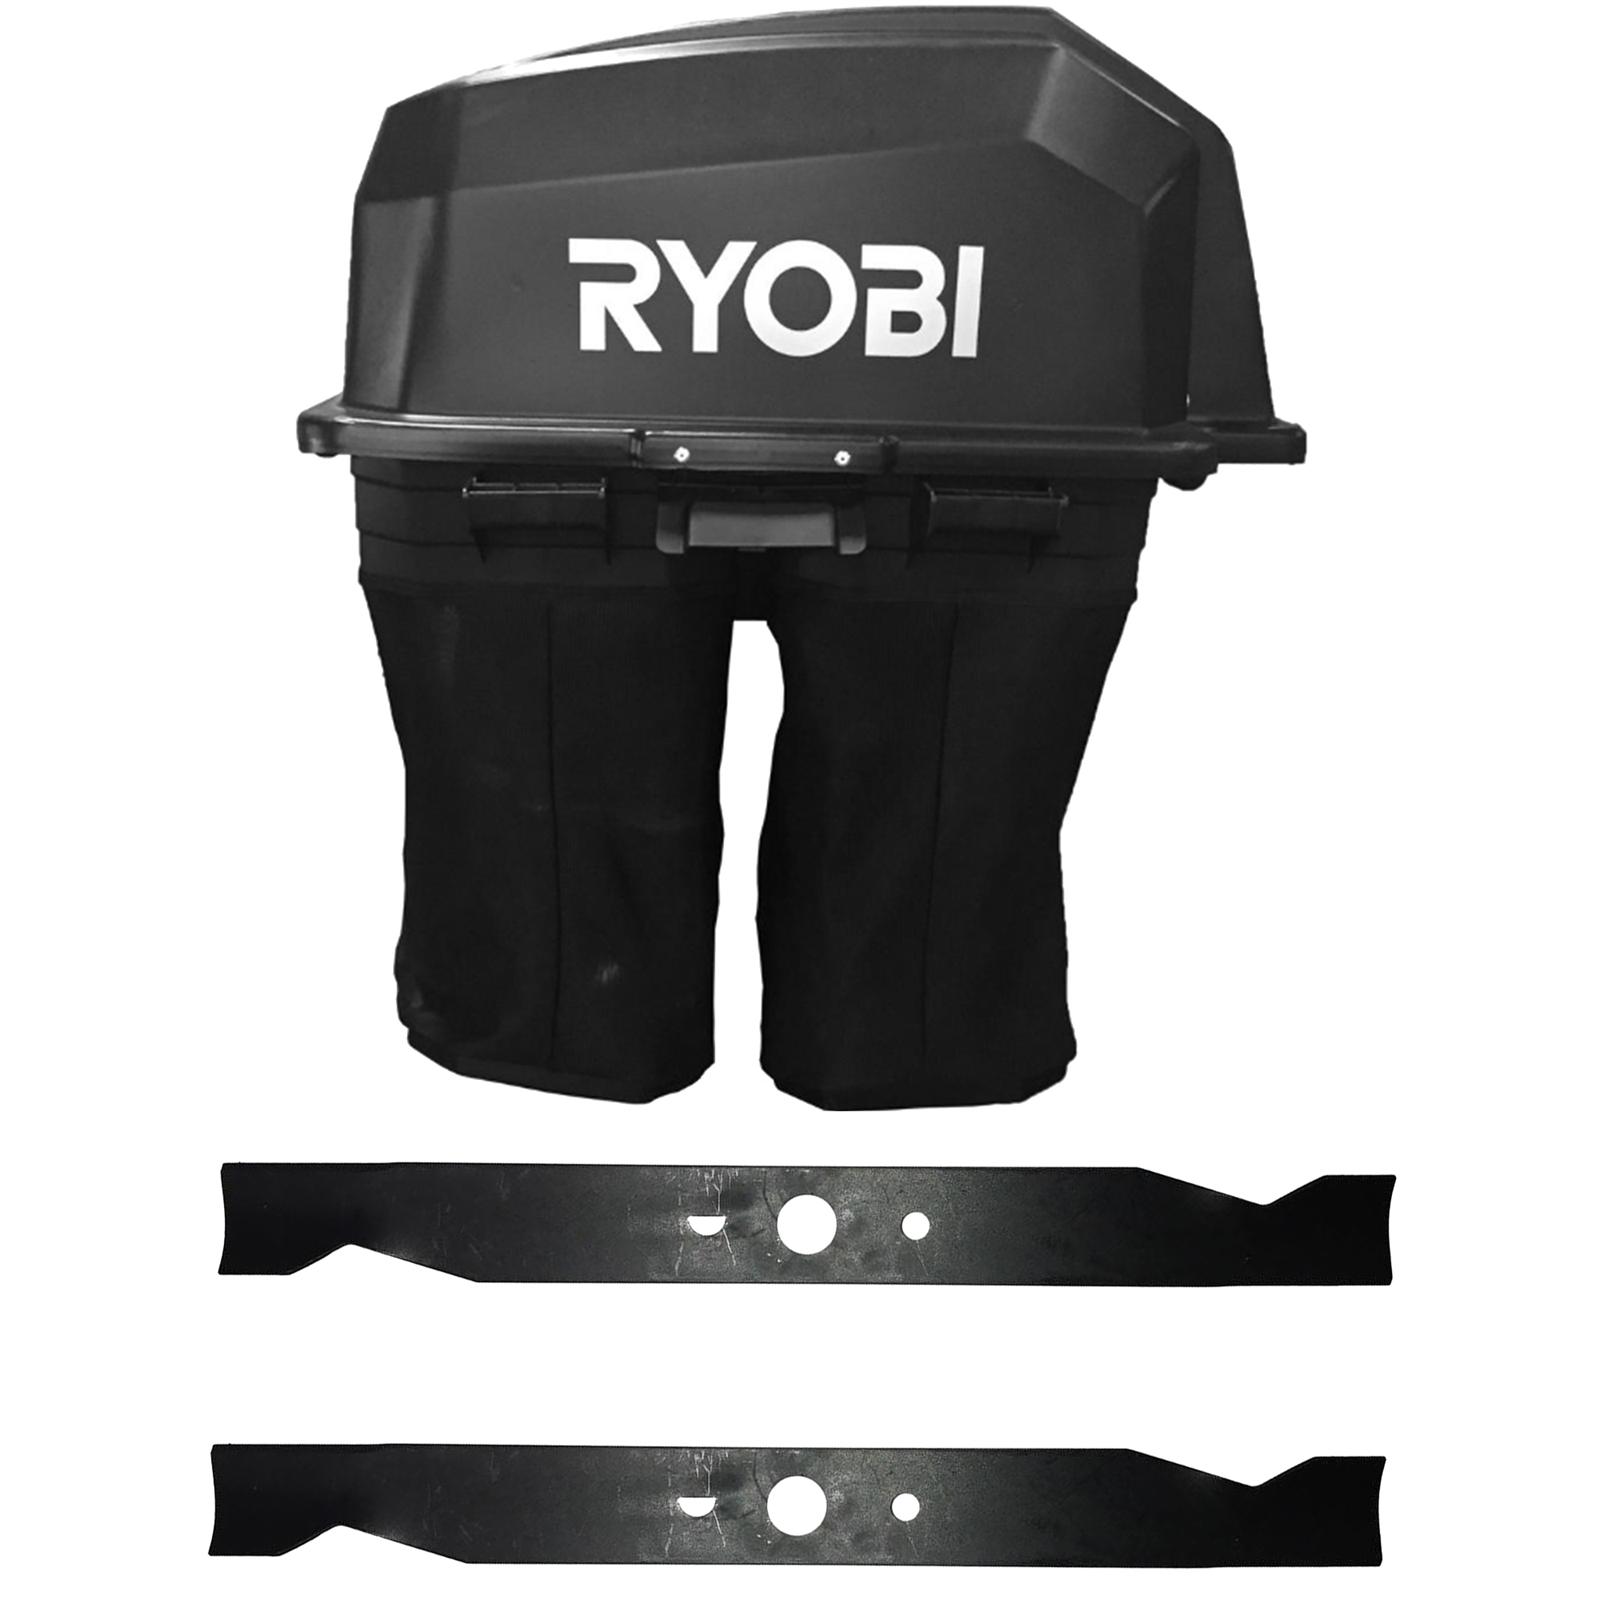 Ryobi Rider Catcher And Blades